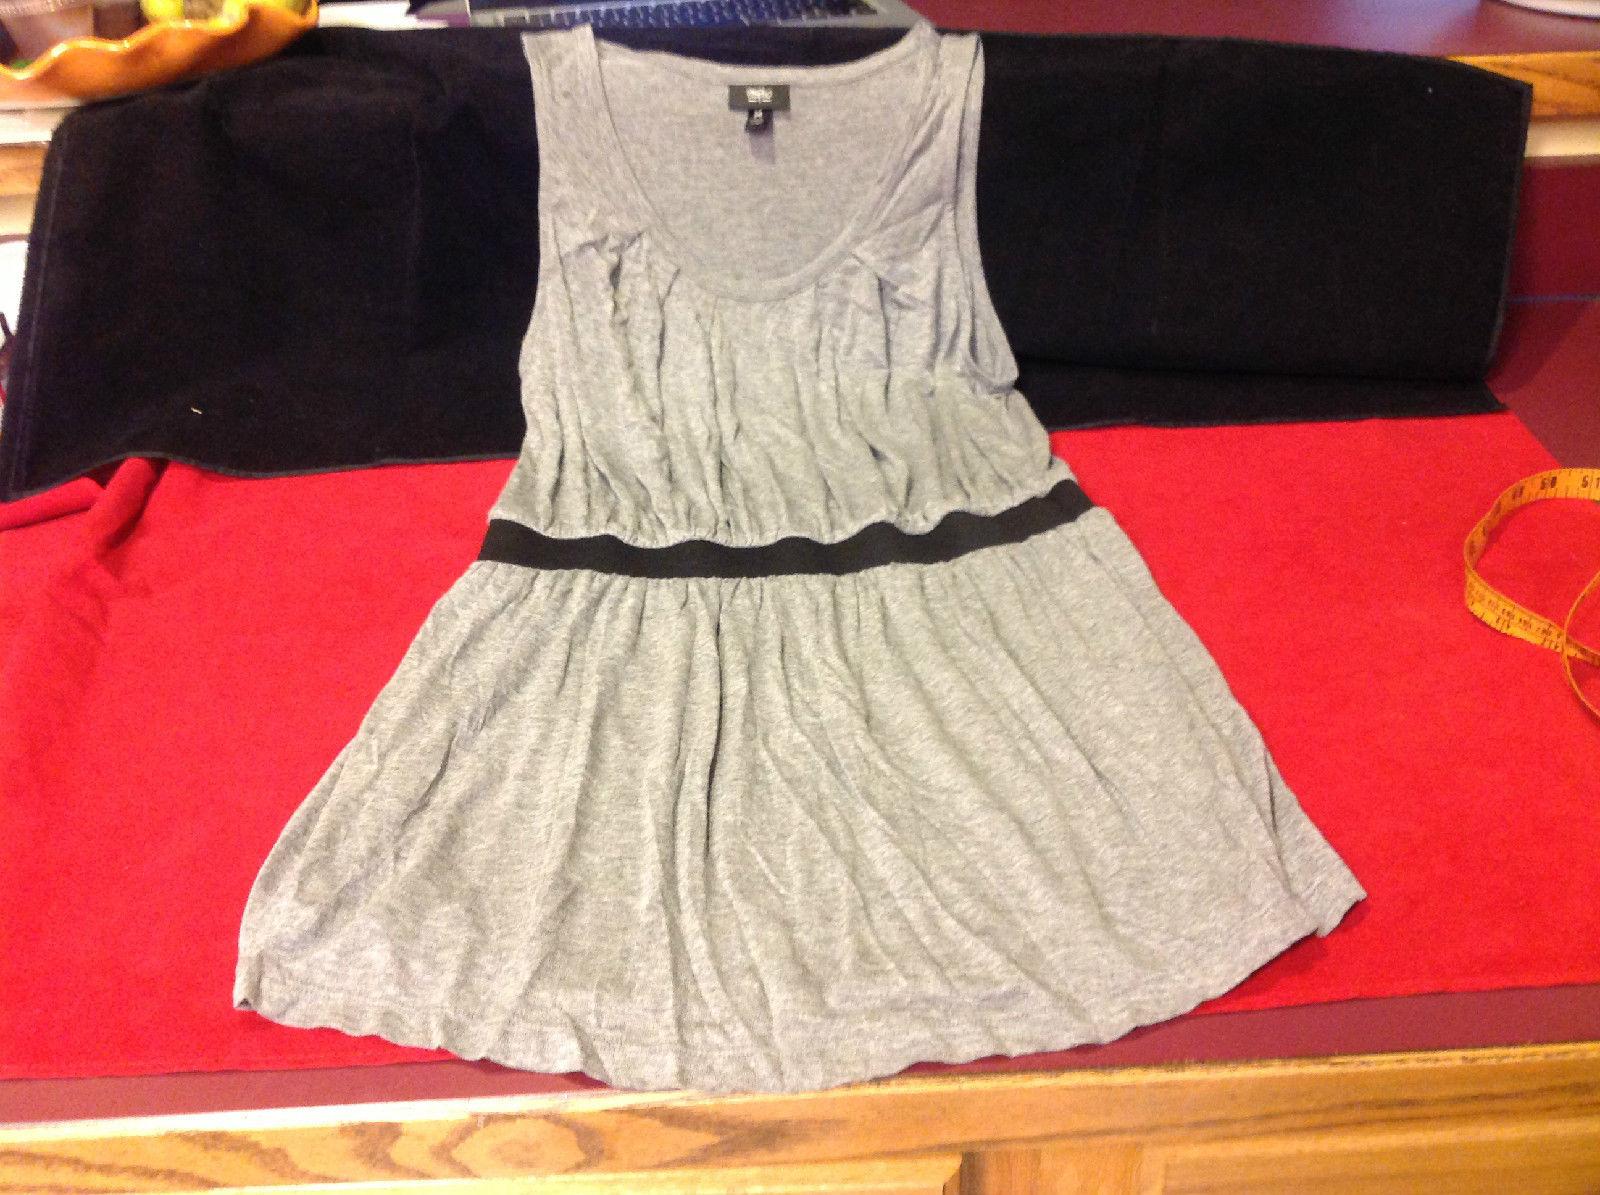 Intessio Ladies Short Heather Gray Sleeveless Dress with Black Belt Size Medium